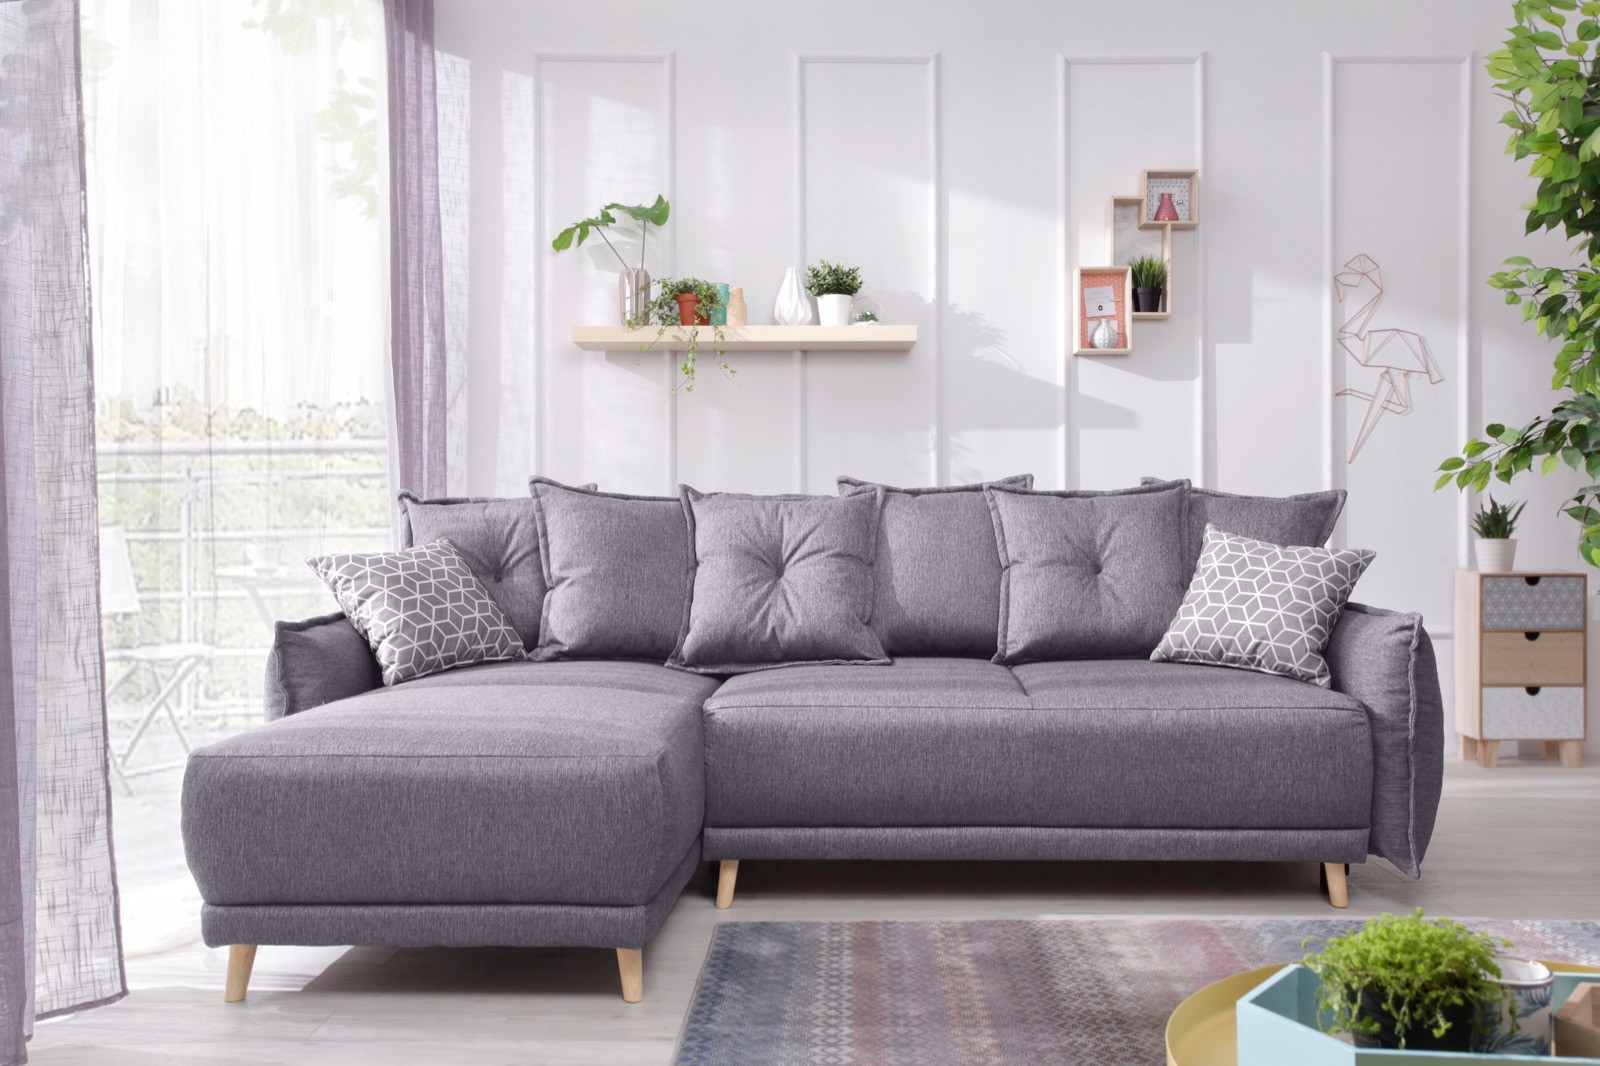 canap d 39 angle r versible convertible coffre lena bobochic. Black Bedroom Furniture Sets. Home Design Ideas